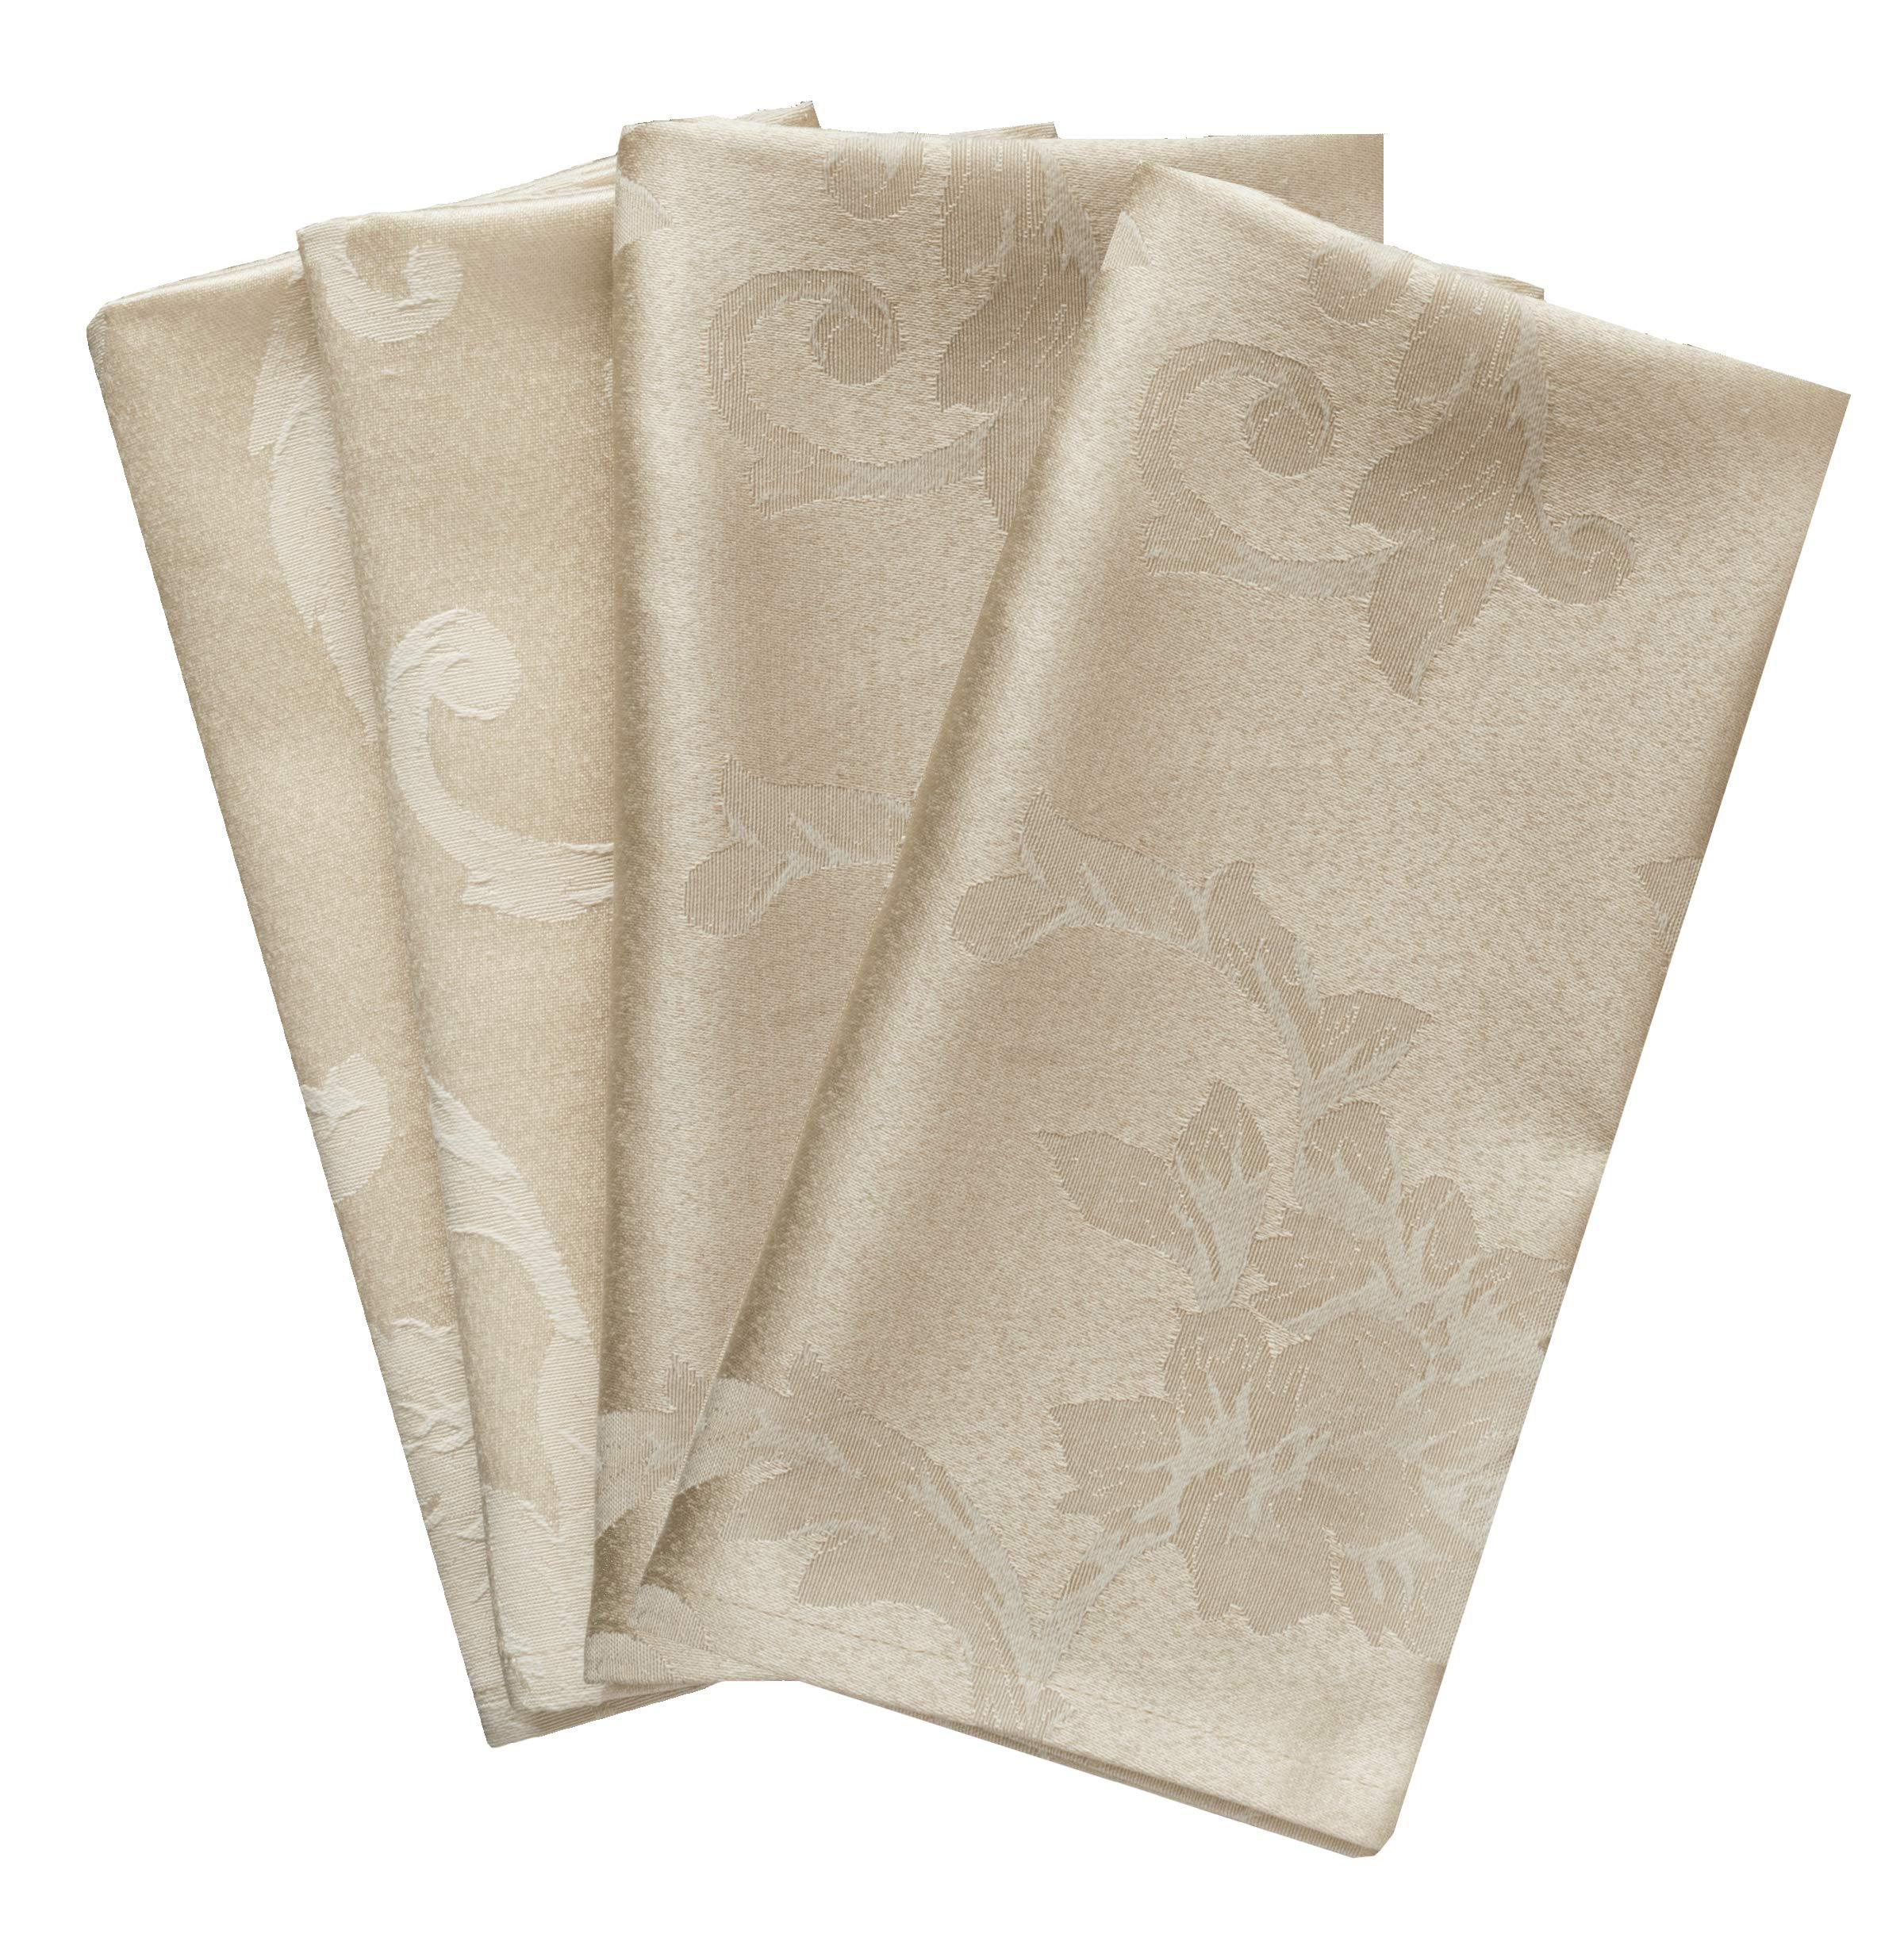 Benson Mills Harmony Scroll Set of 4 Napkins (Birch, 18'' x 18'' Napkin)